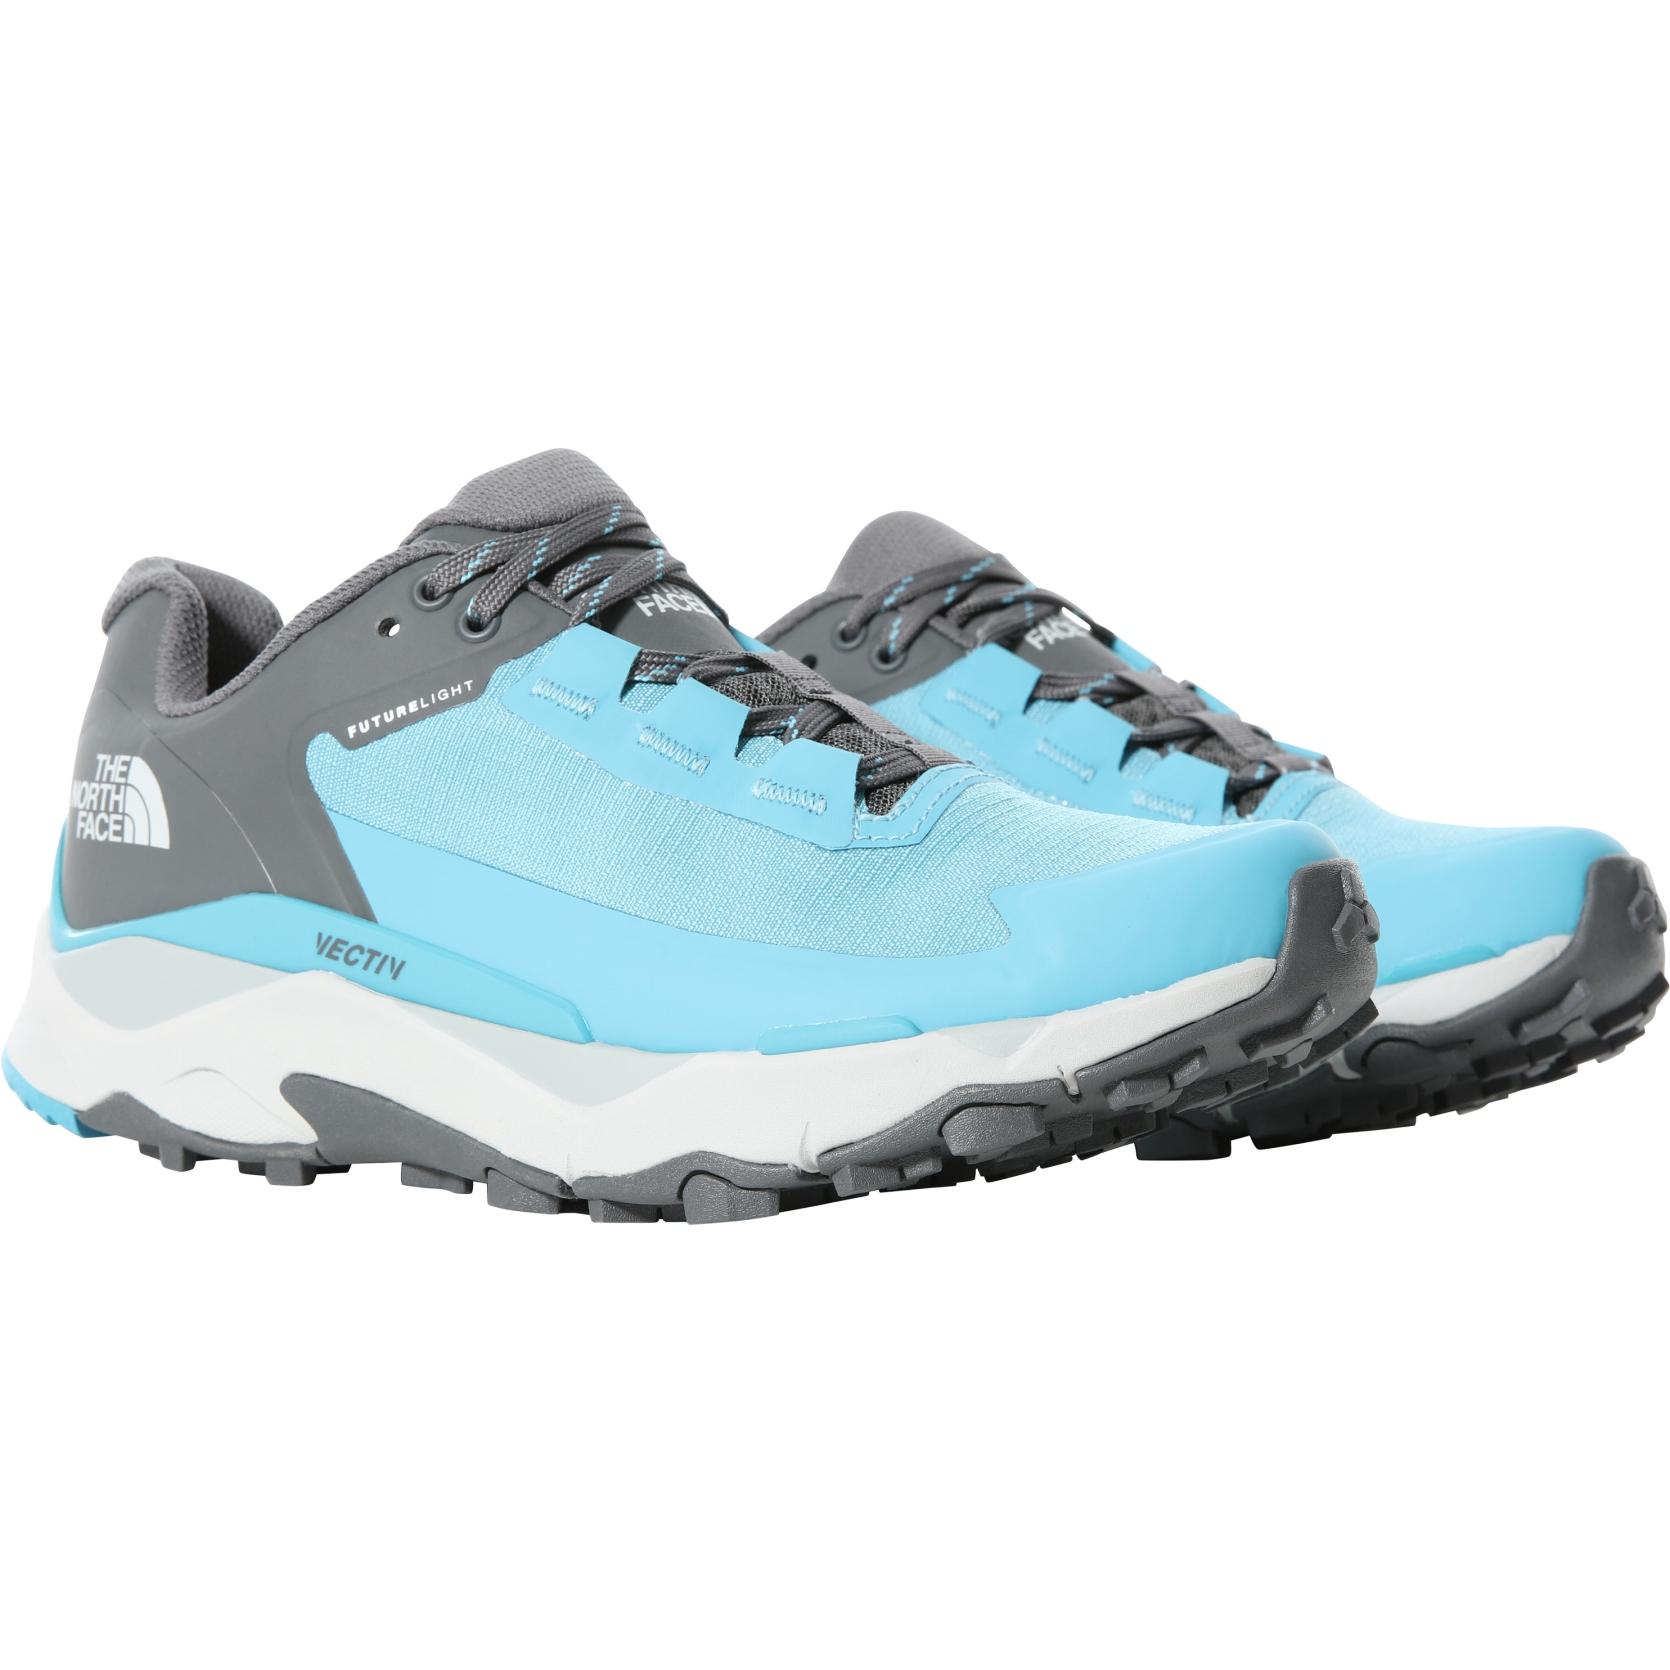 The North Face Damen Vectiv Exploris Futurelight Schuhe - Maui Blue/Zinc Grey